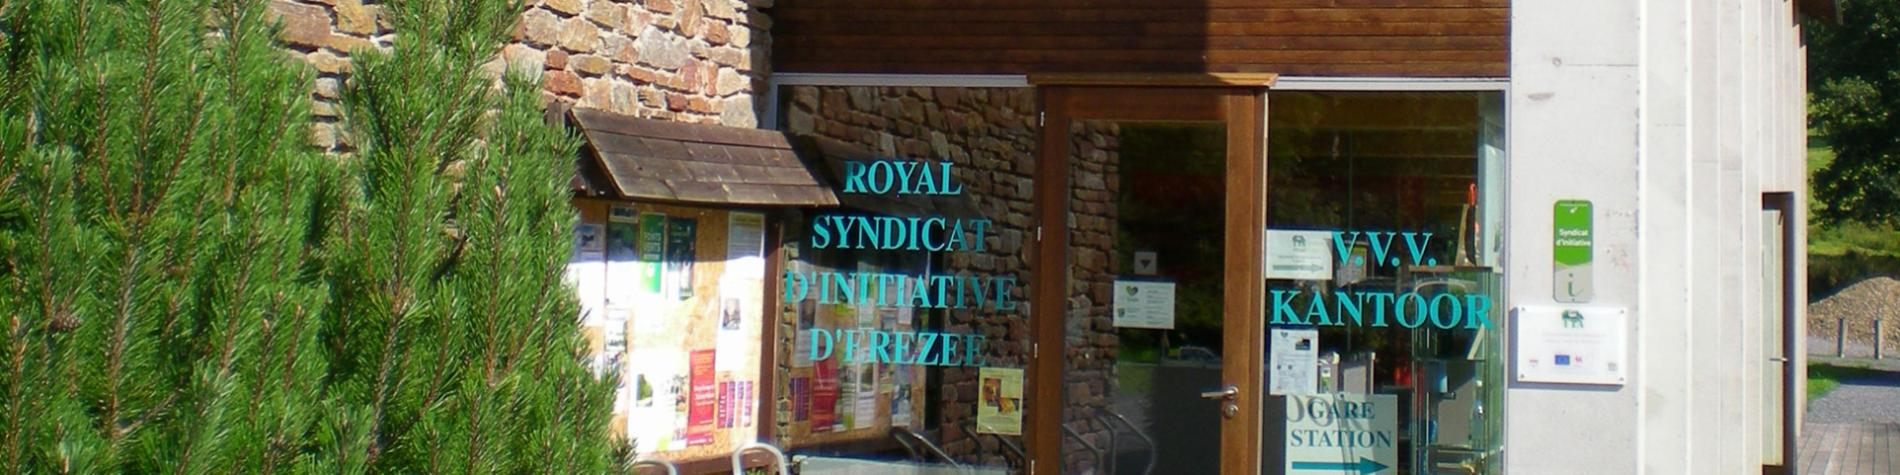 Royal Syndicat d'Initiative d'Erezée